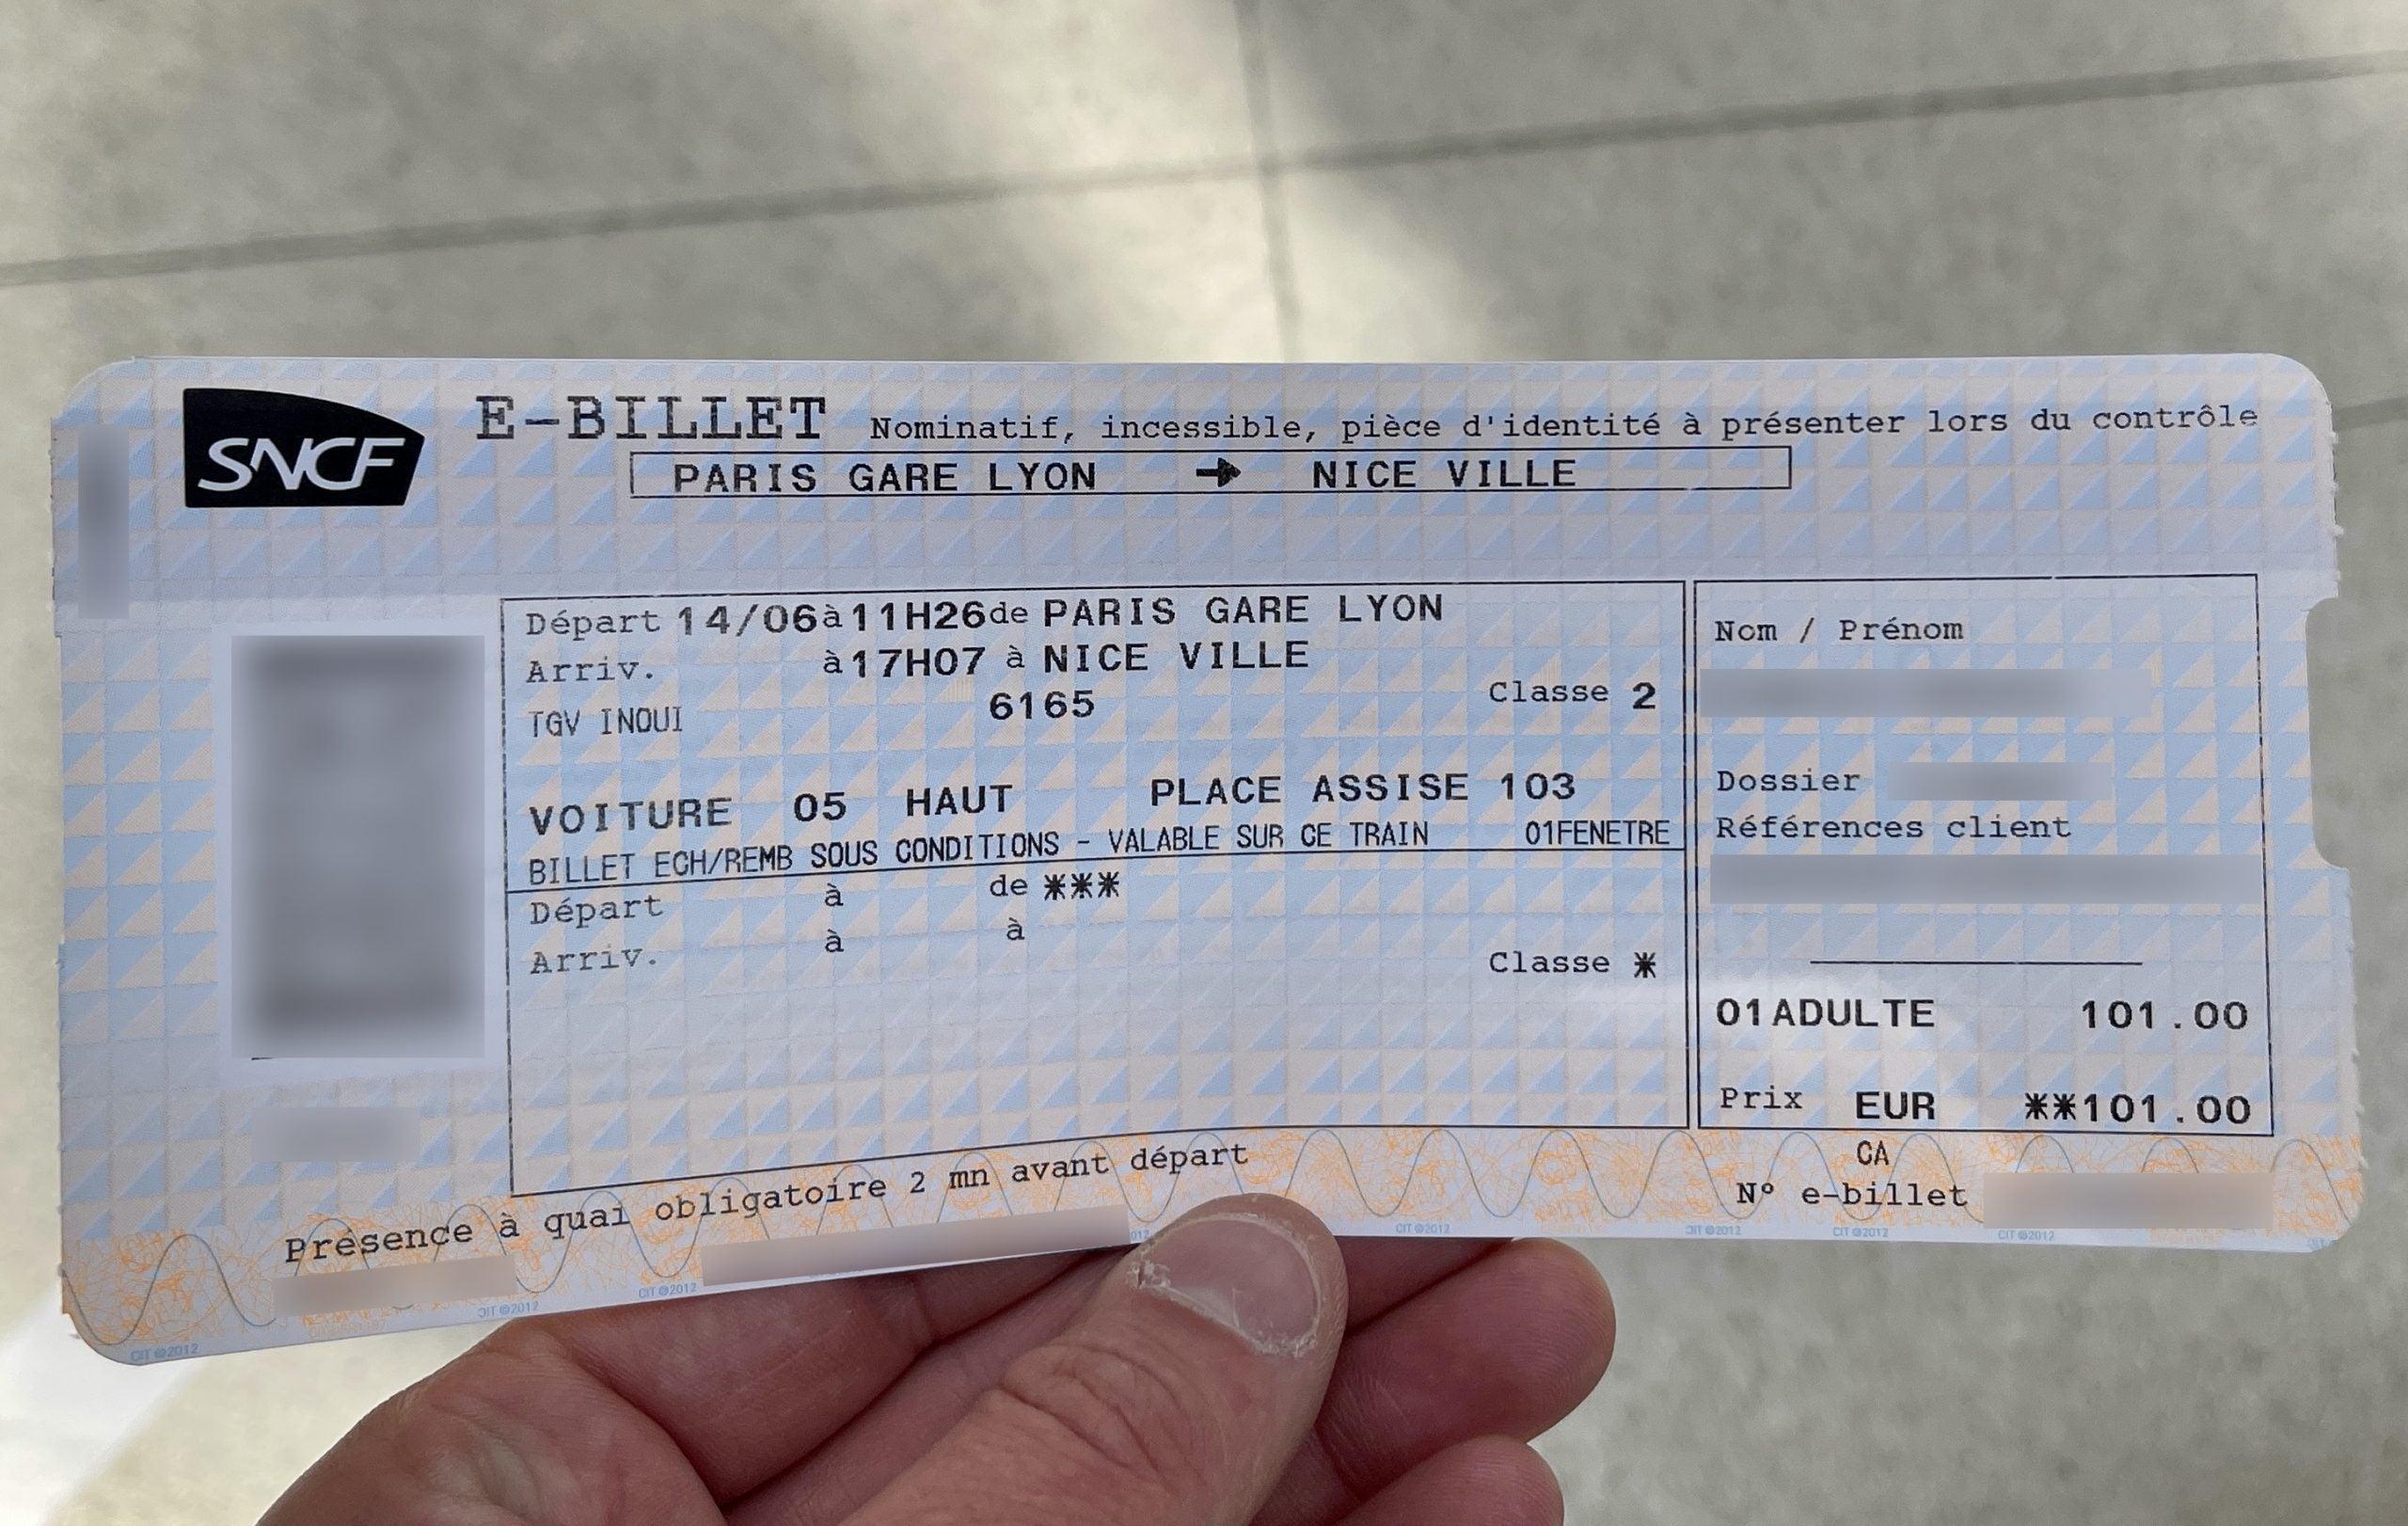 SNCF TGV train ticket from Paris to Nice